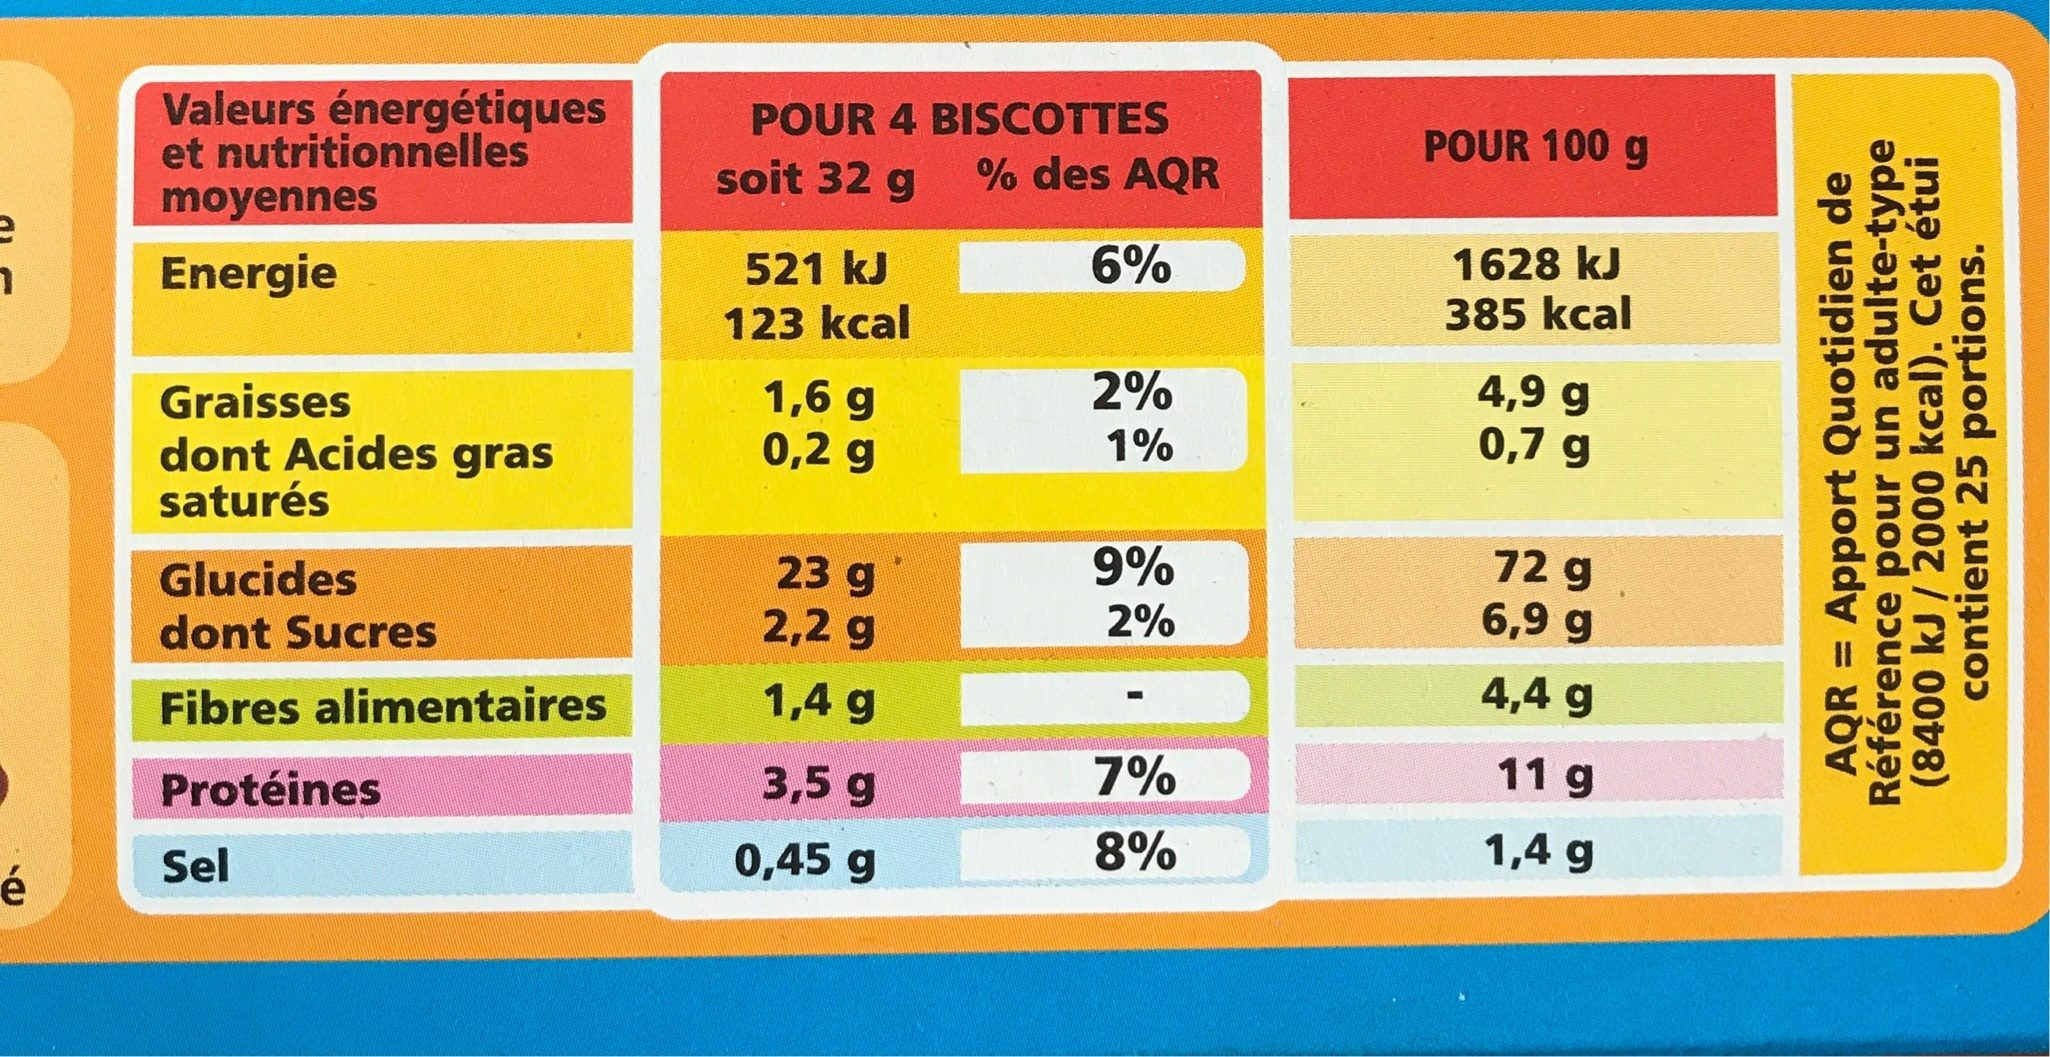 Biscottes au froment 100 Tranches - Informations nutritionnelles - fr